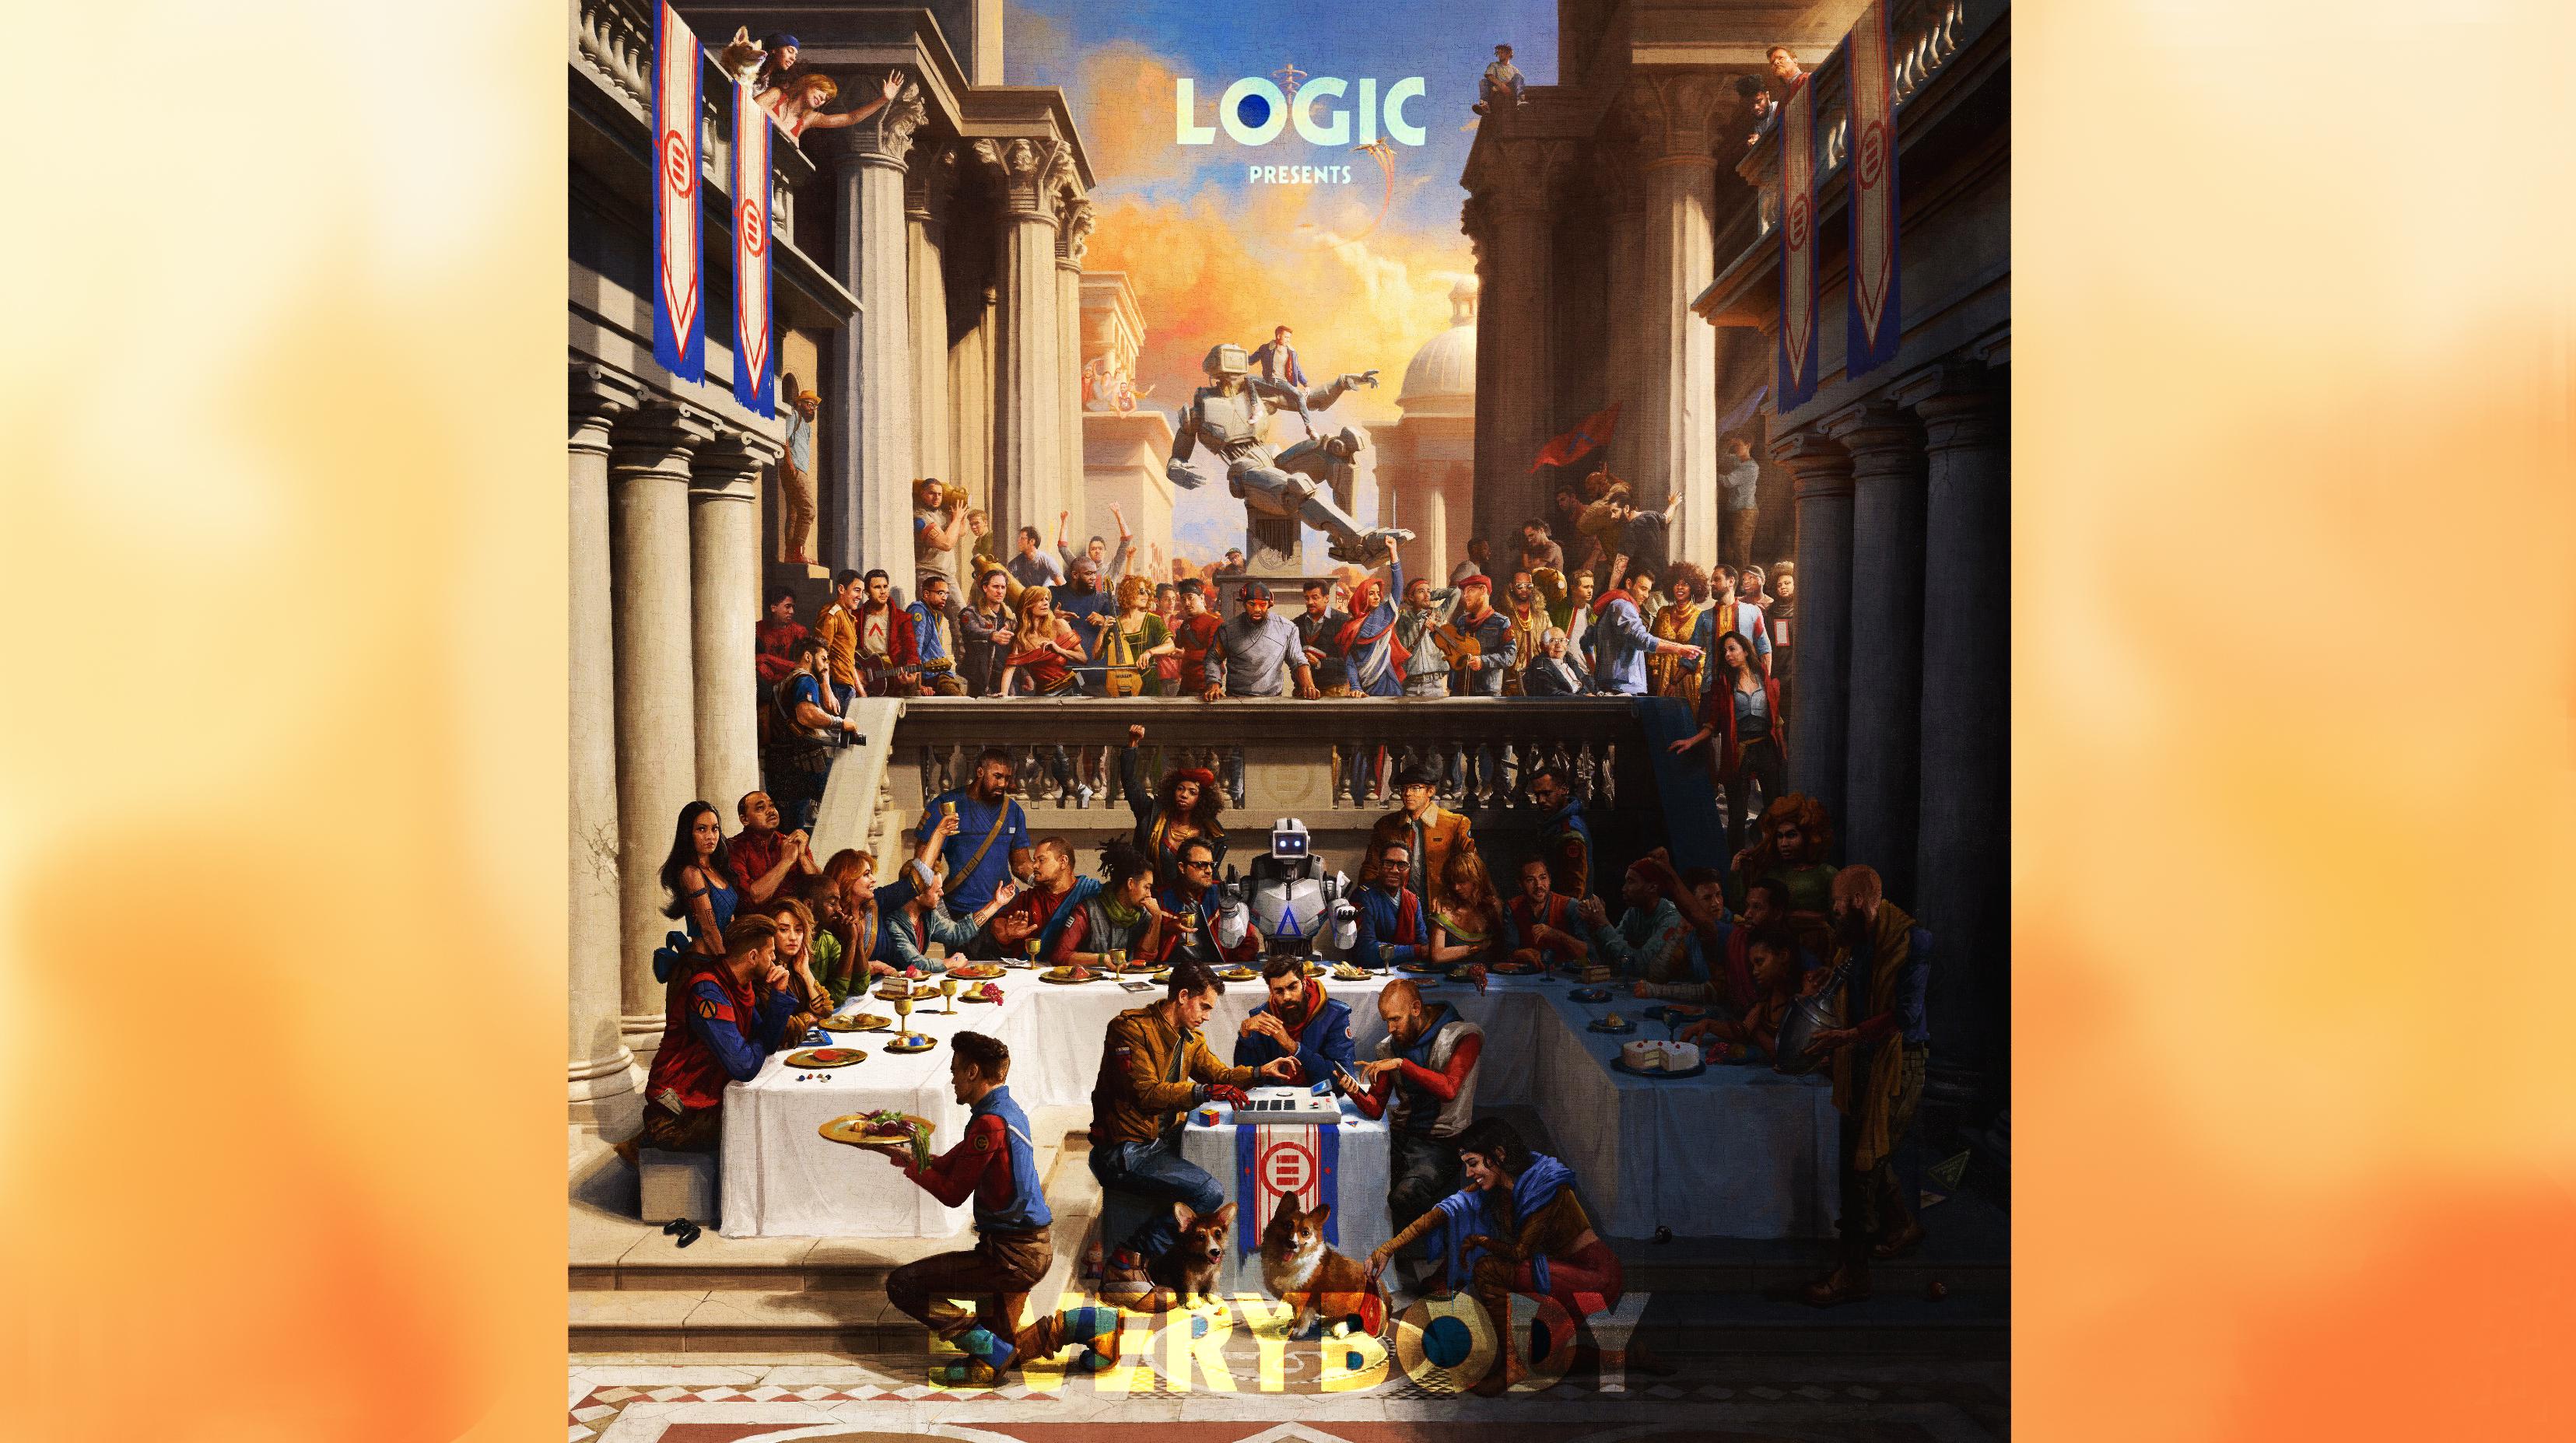 Logic Wallpaper Iphone 6 Logic Everybody Desktop Wallpaper Logic 301